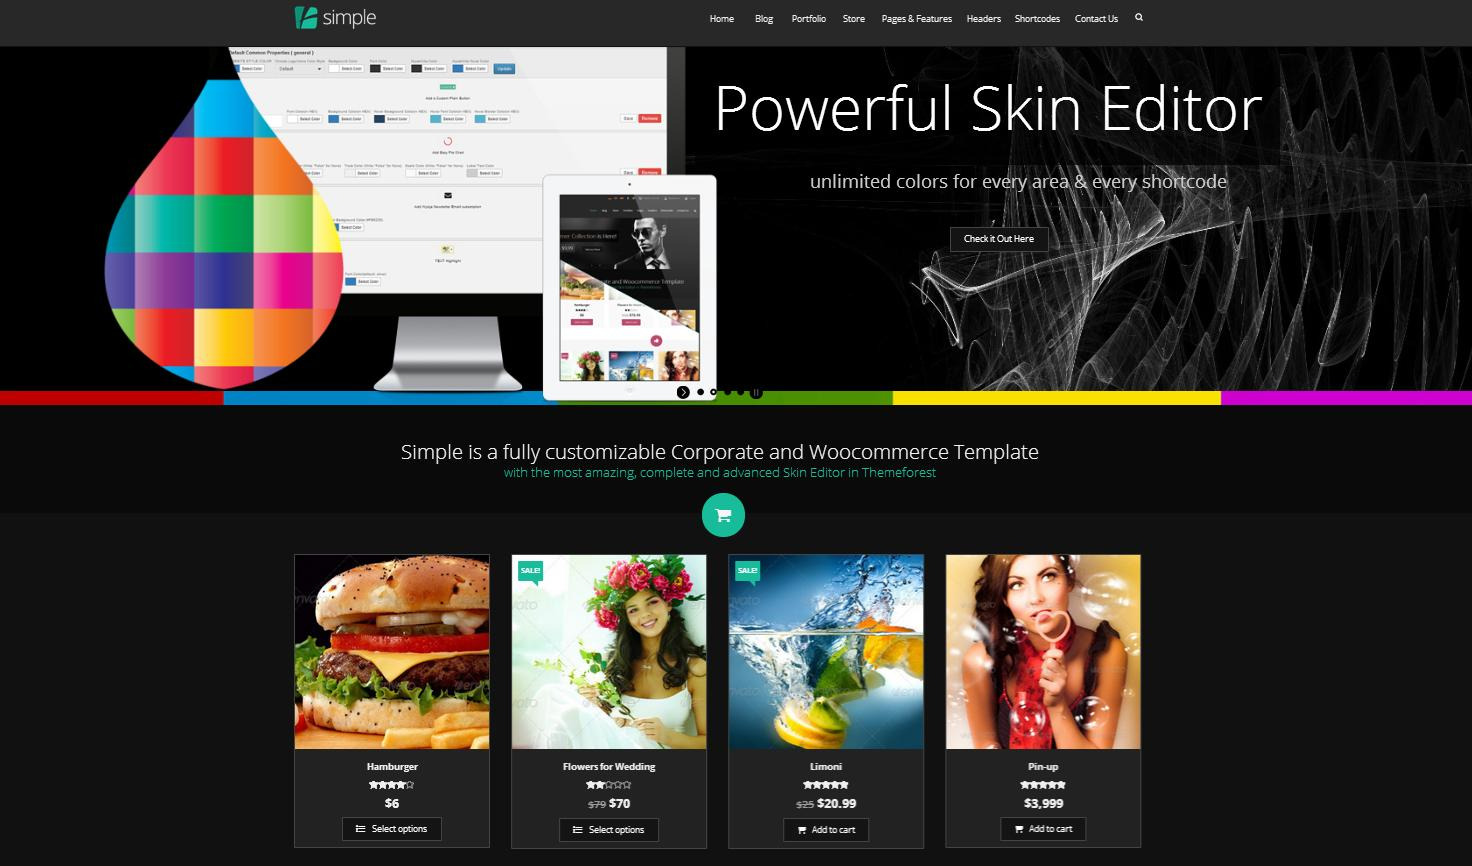 Simple | Woocommerce Corporate + Skin Editor Pro - Premium wordpress themes|Ecommerce>WooCommerce